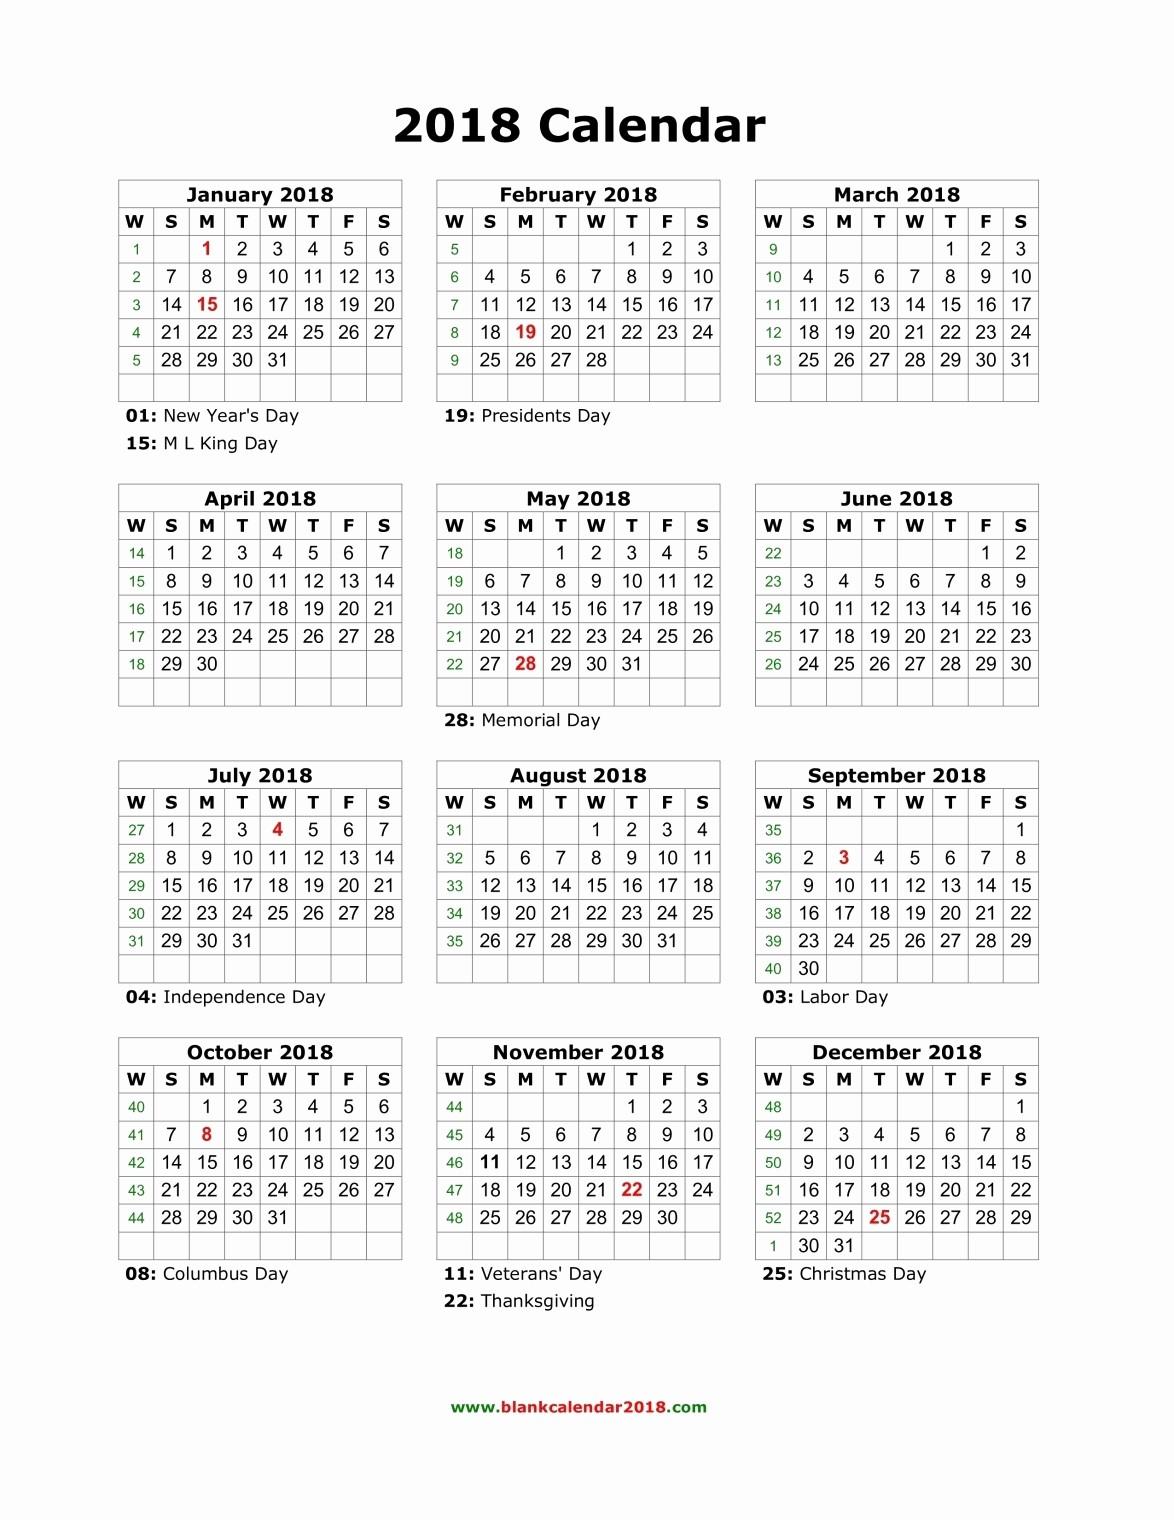 Calendar 2018 Printable with Holidays Awesome Blank Holidays Calendar 2018 Portrait